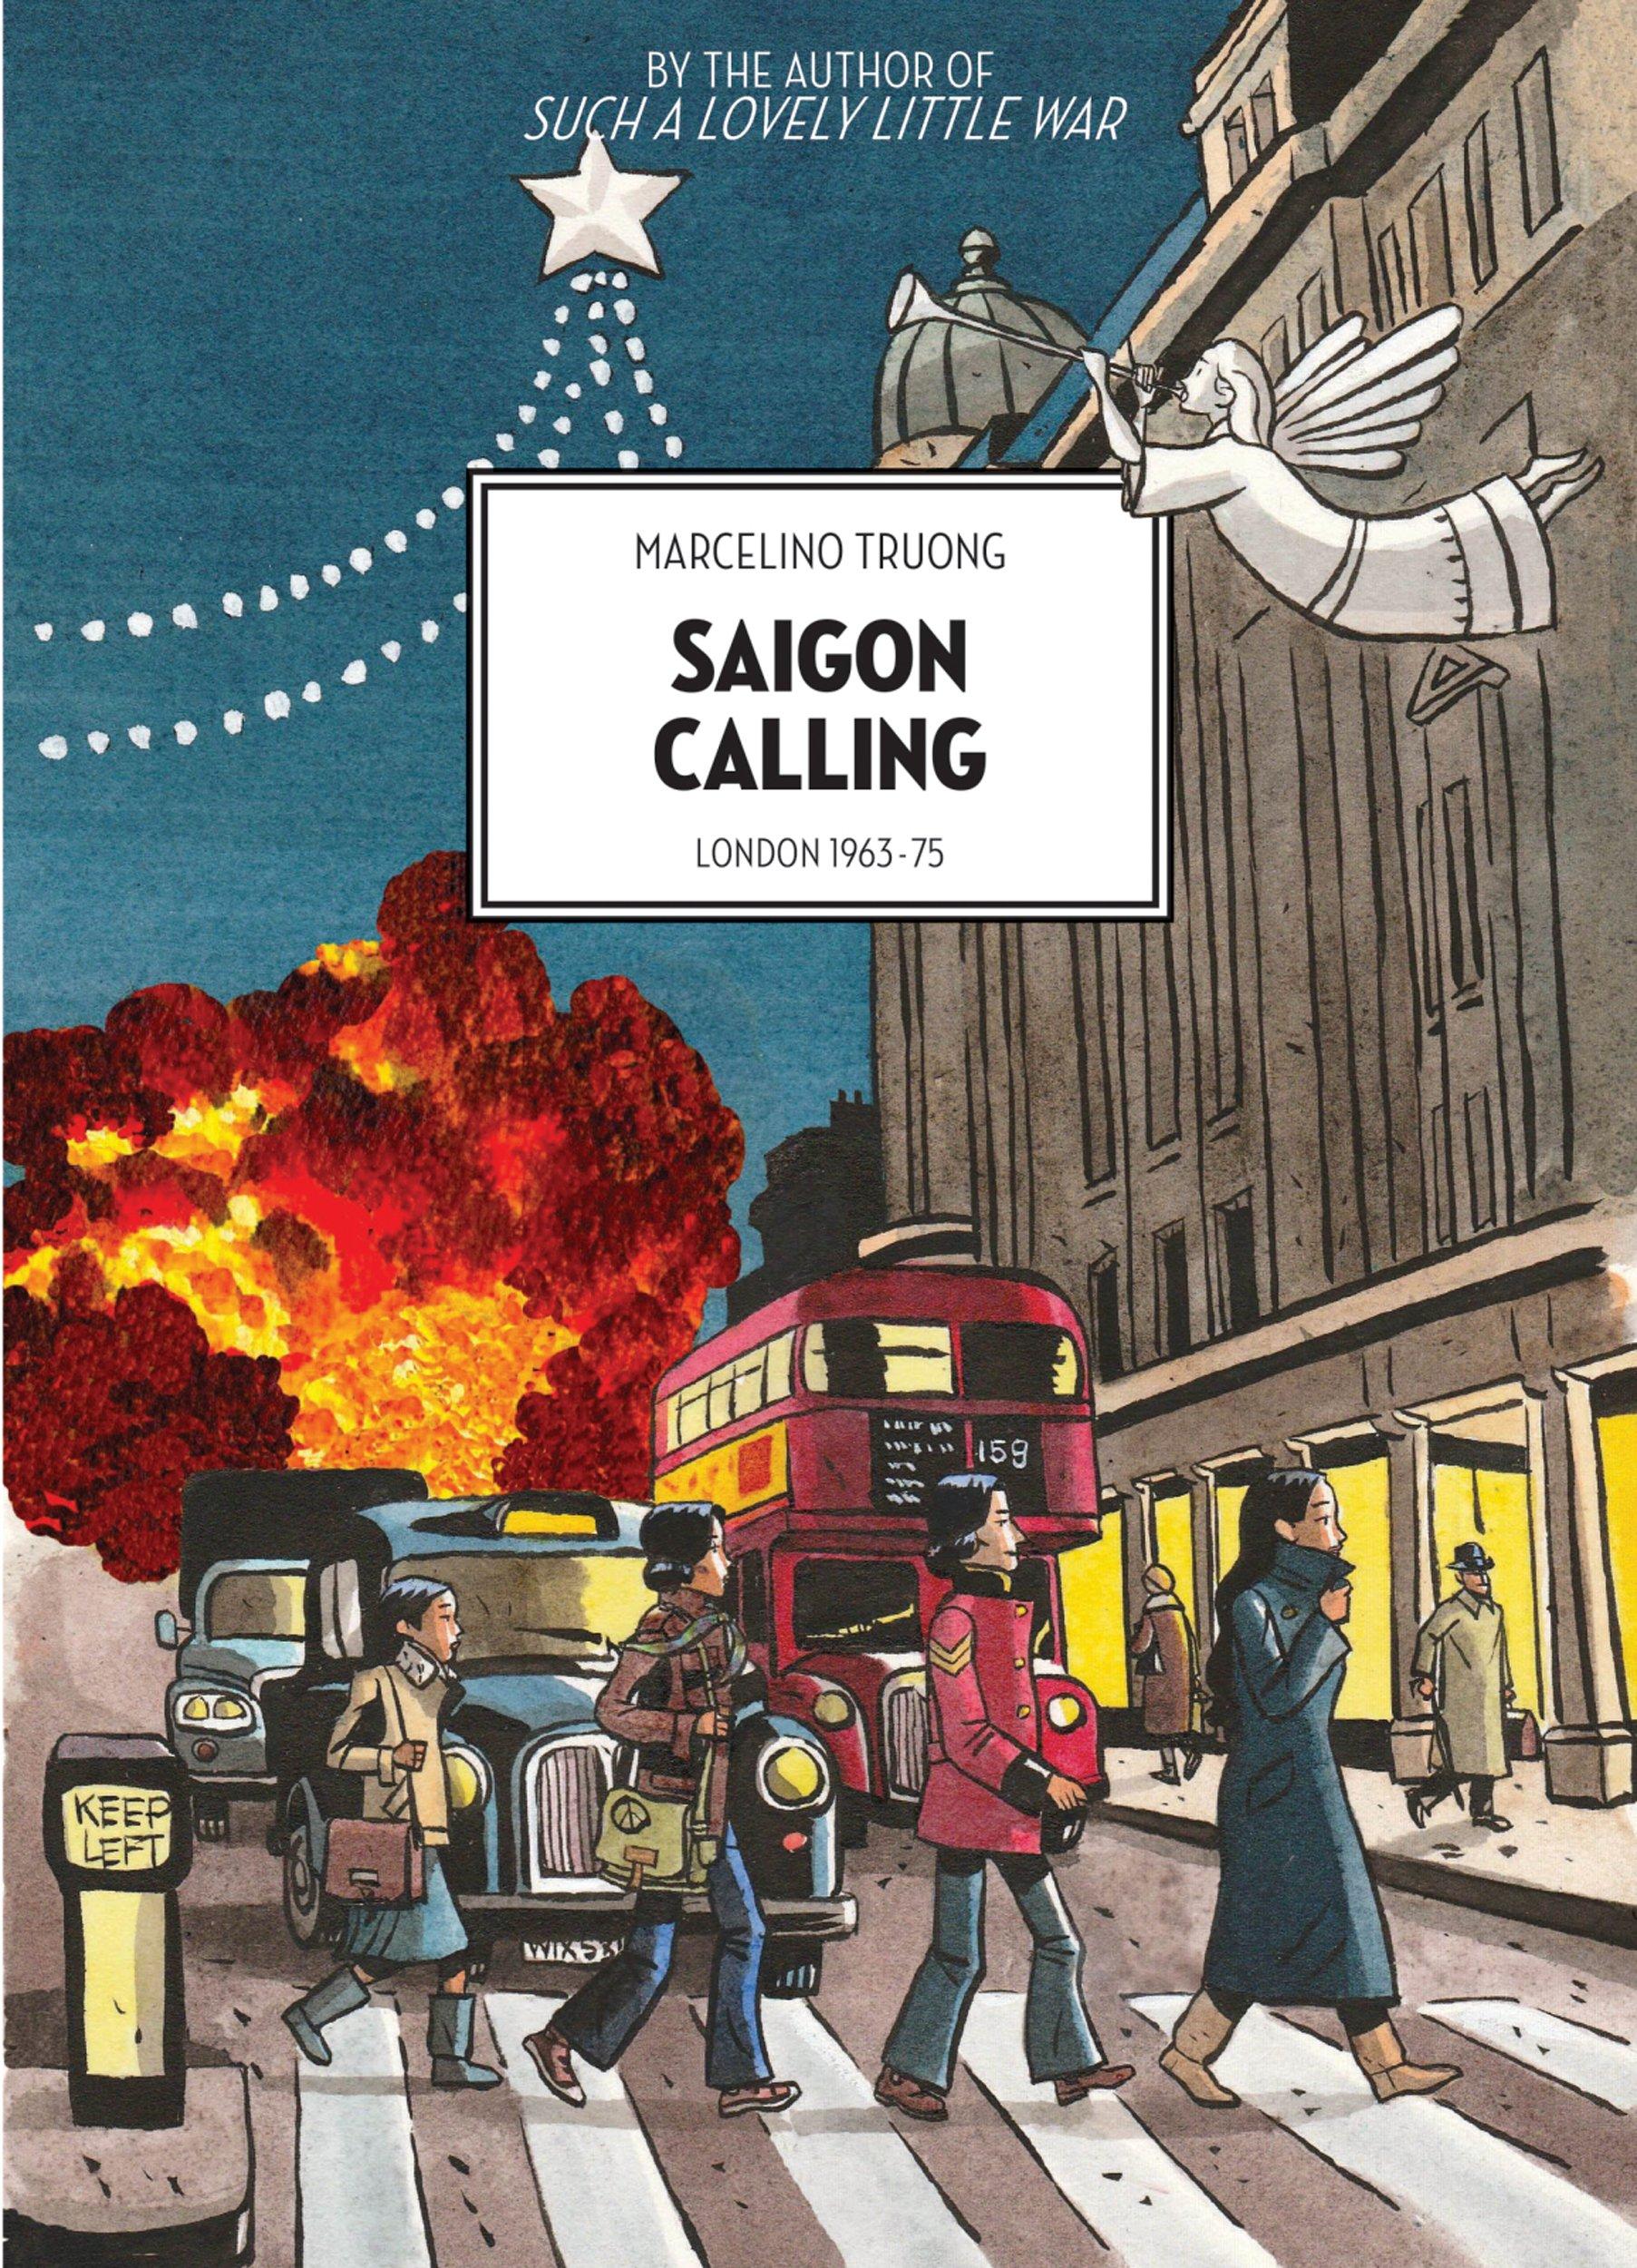 Saigon Calling: London 1963-75